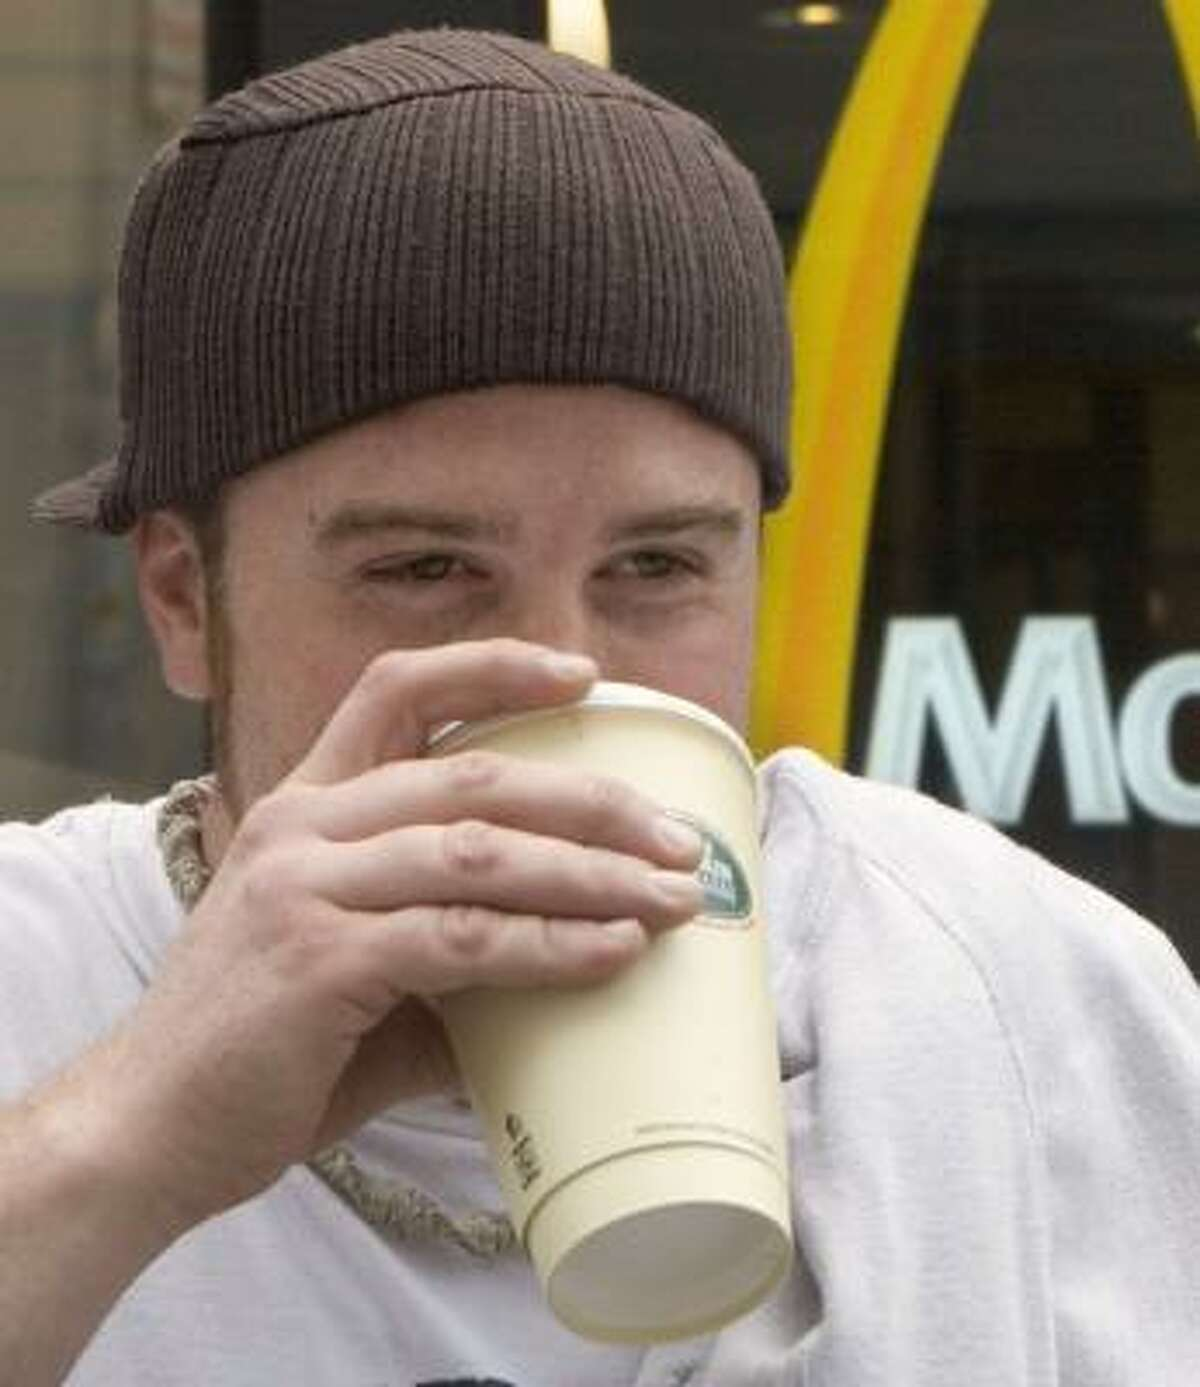 Paul Landry has coffee in Cambridge, Mass.